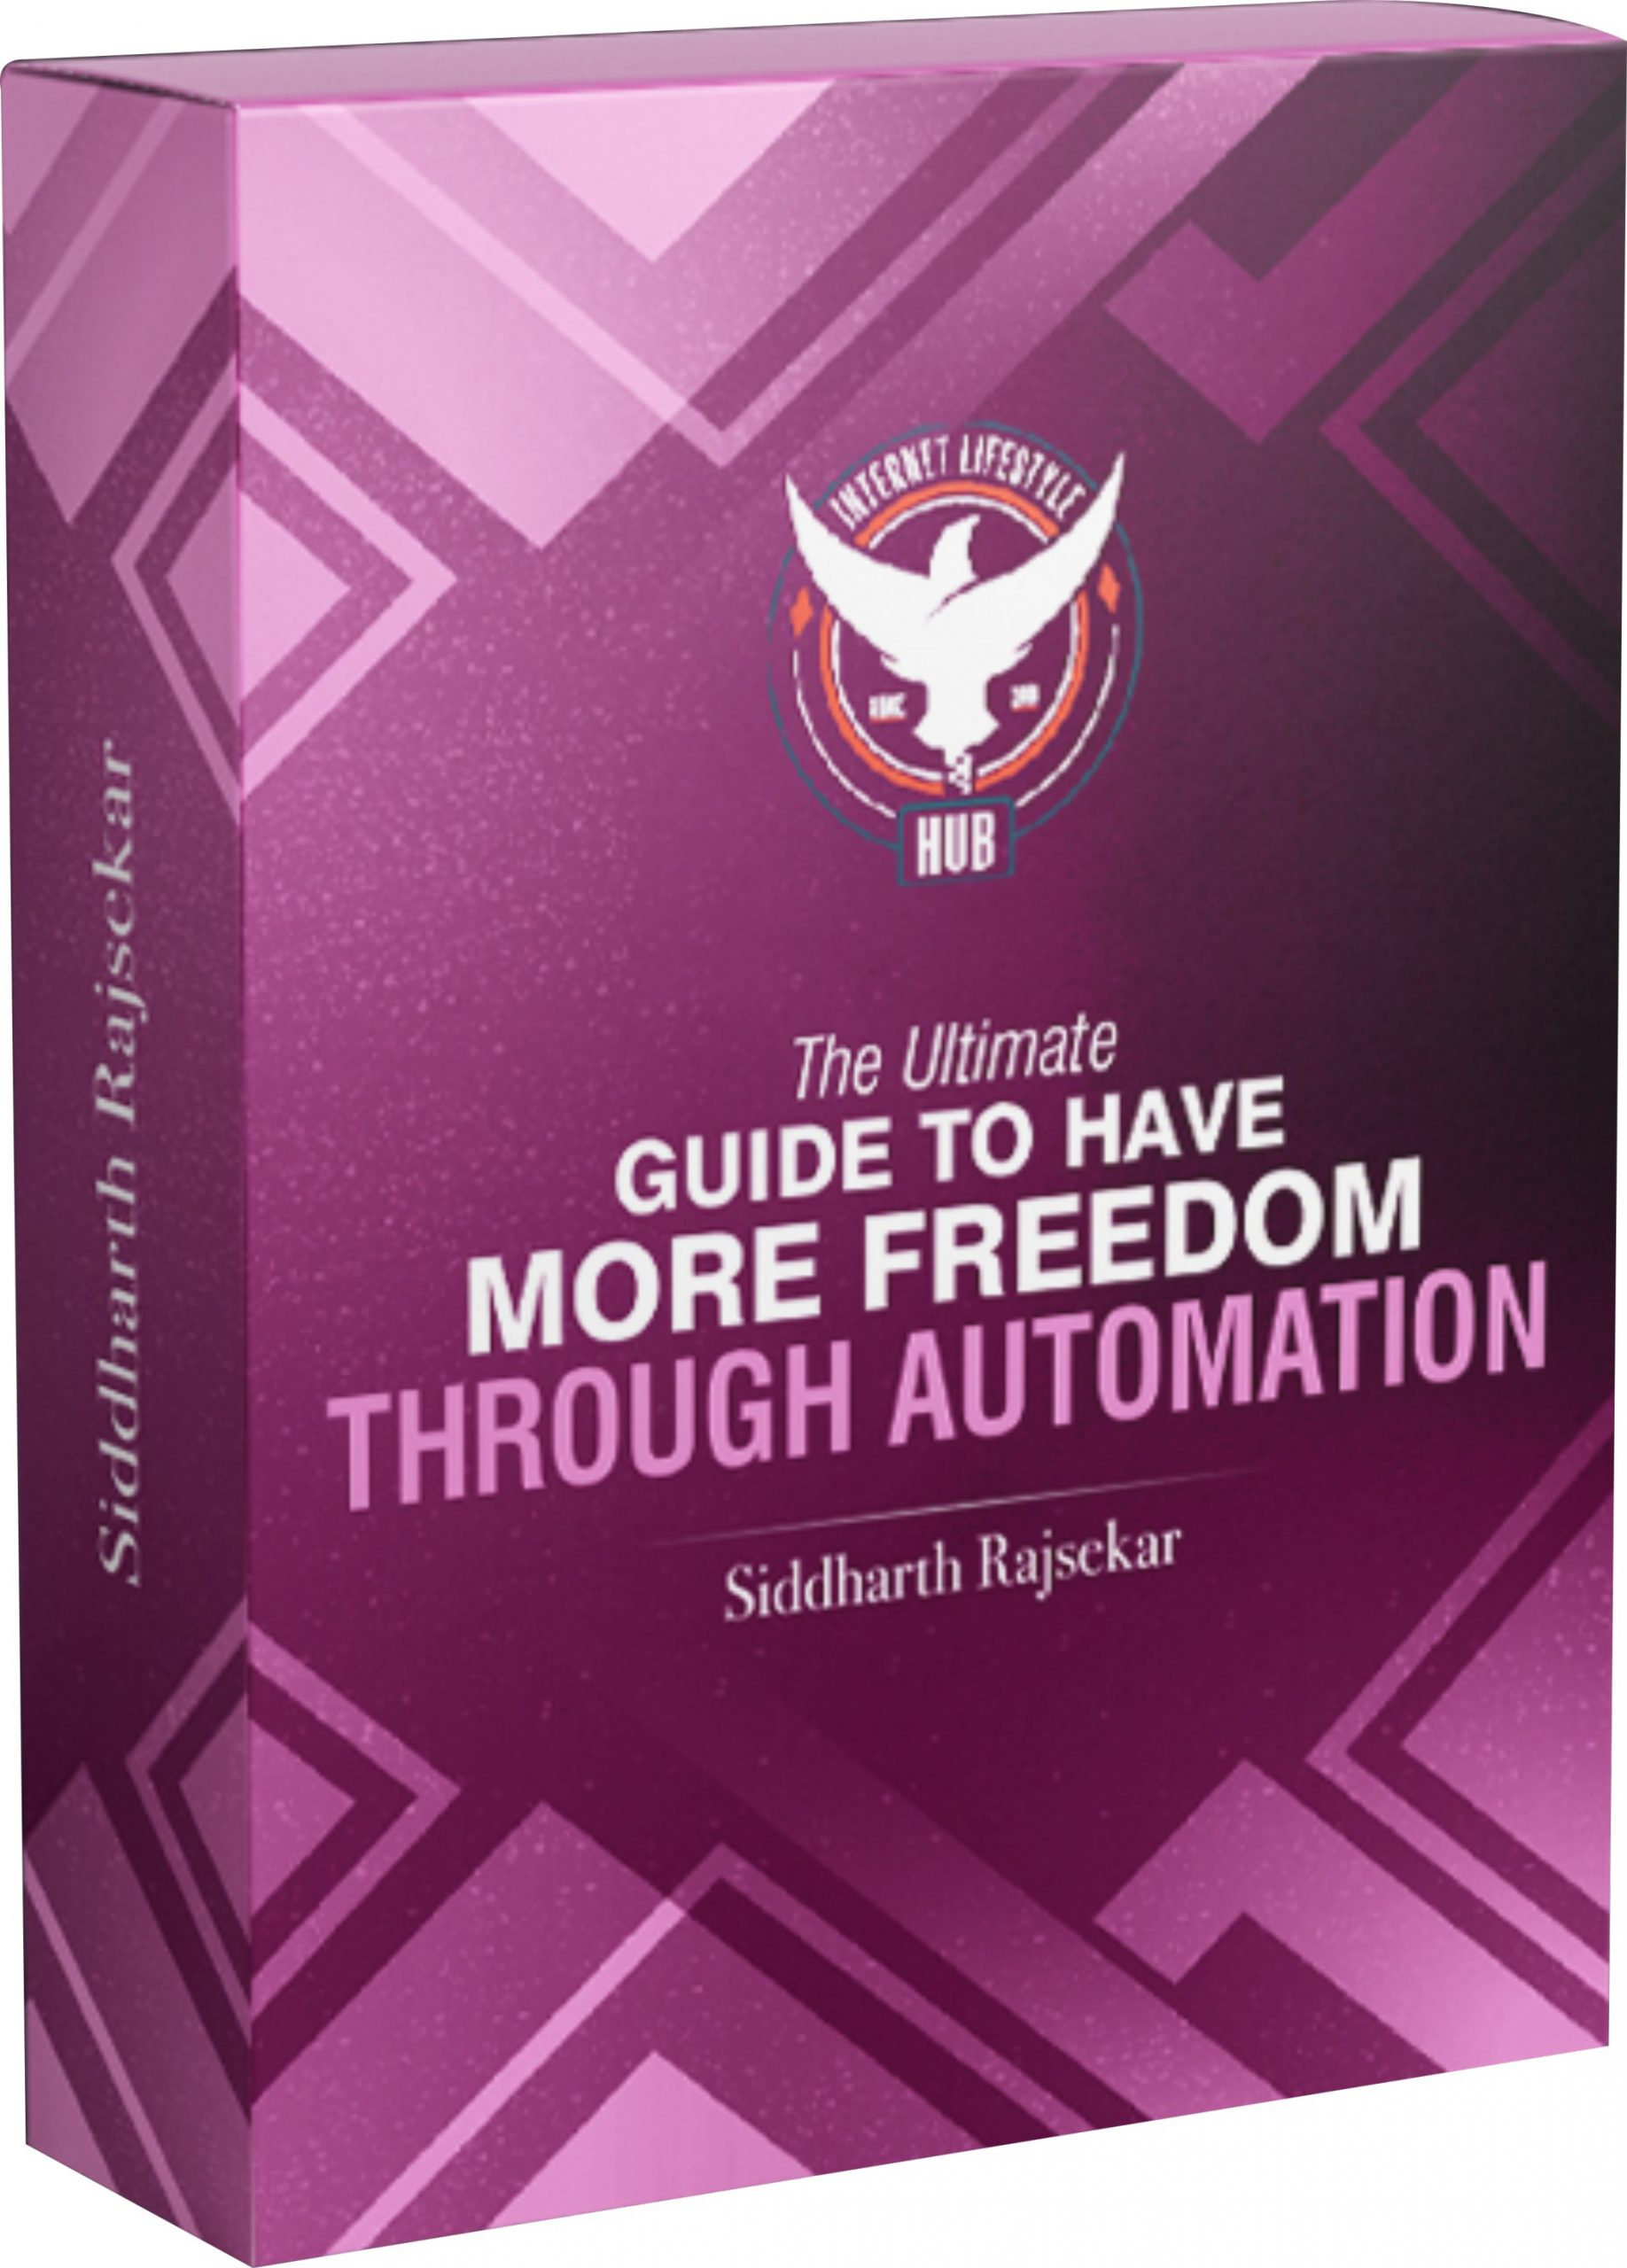 Freedom Through Automation